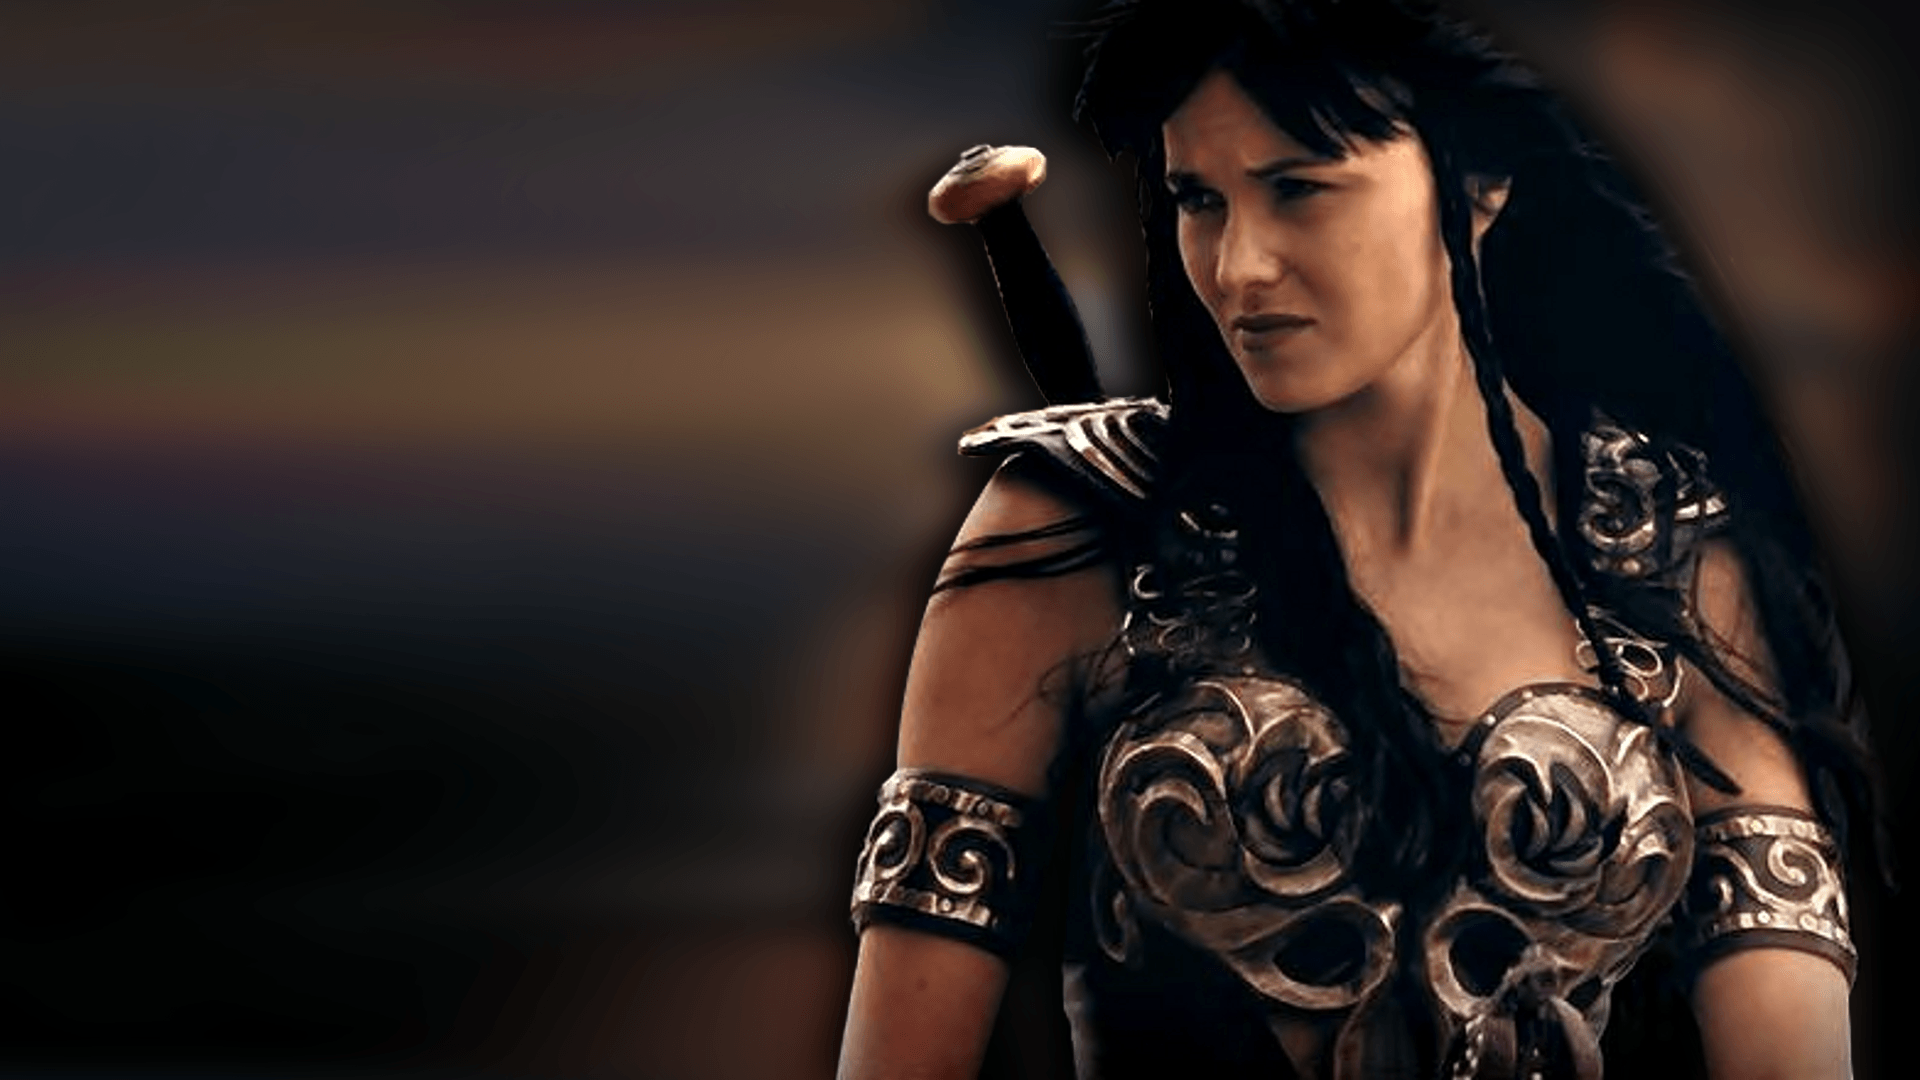 Xena: Warrior Princess Wallpapers - Wallpaper Cave